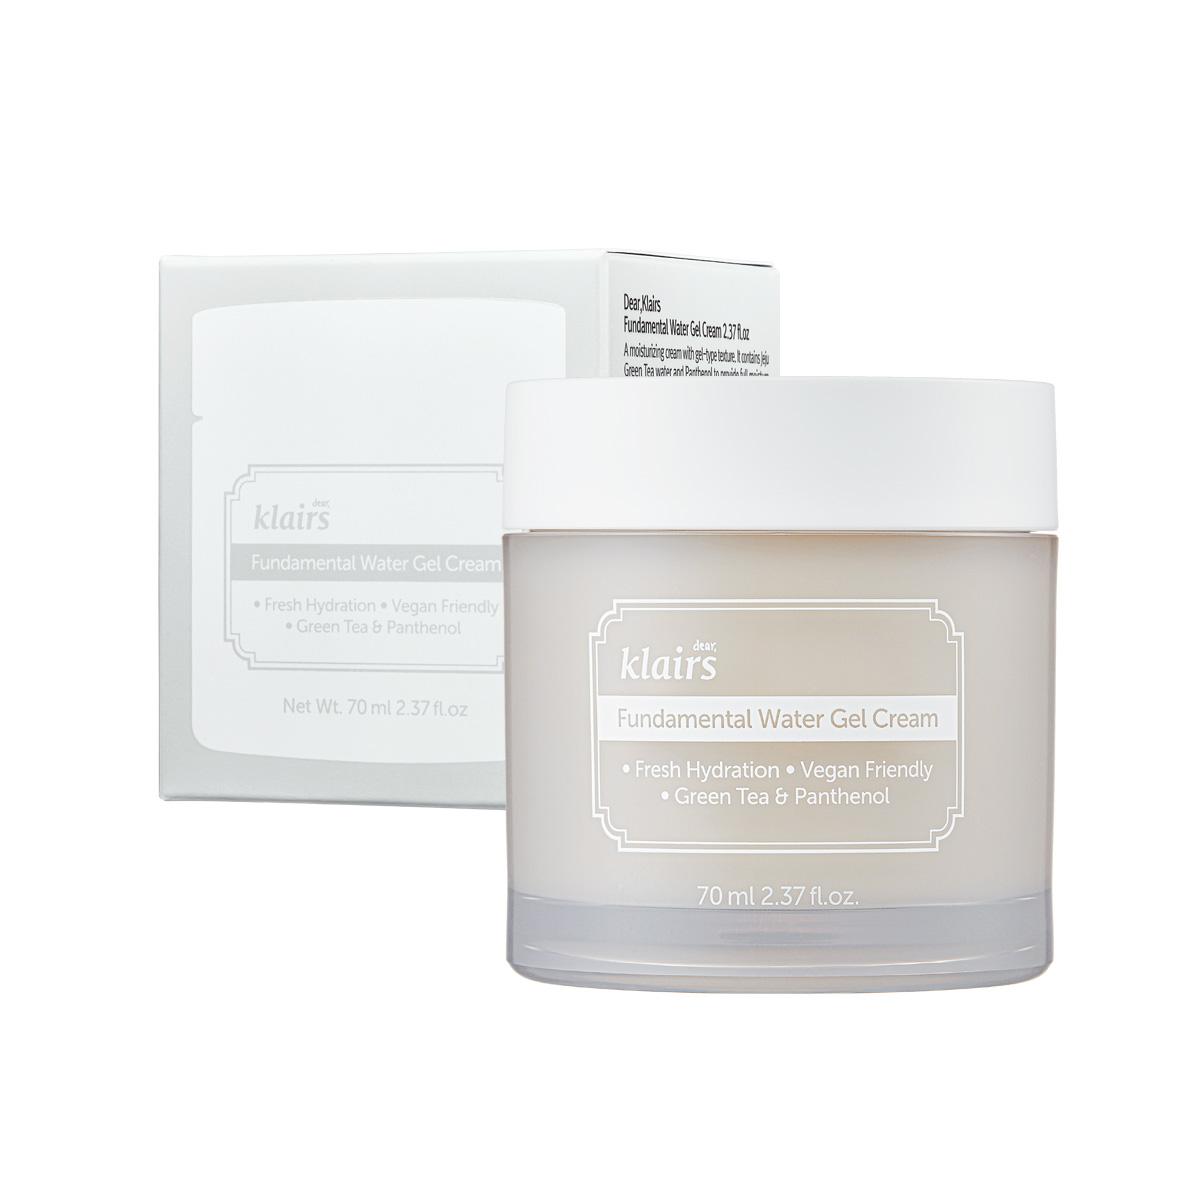 KLAIRS Fundamental Water Gel Cream 70ml